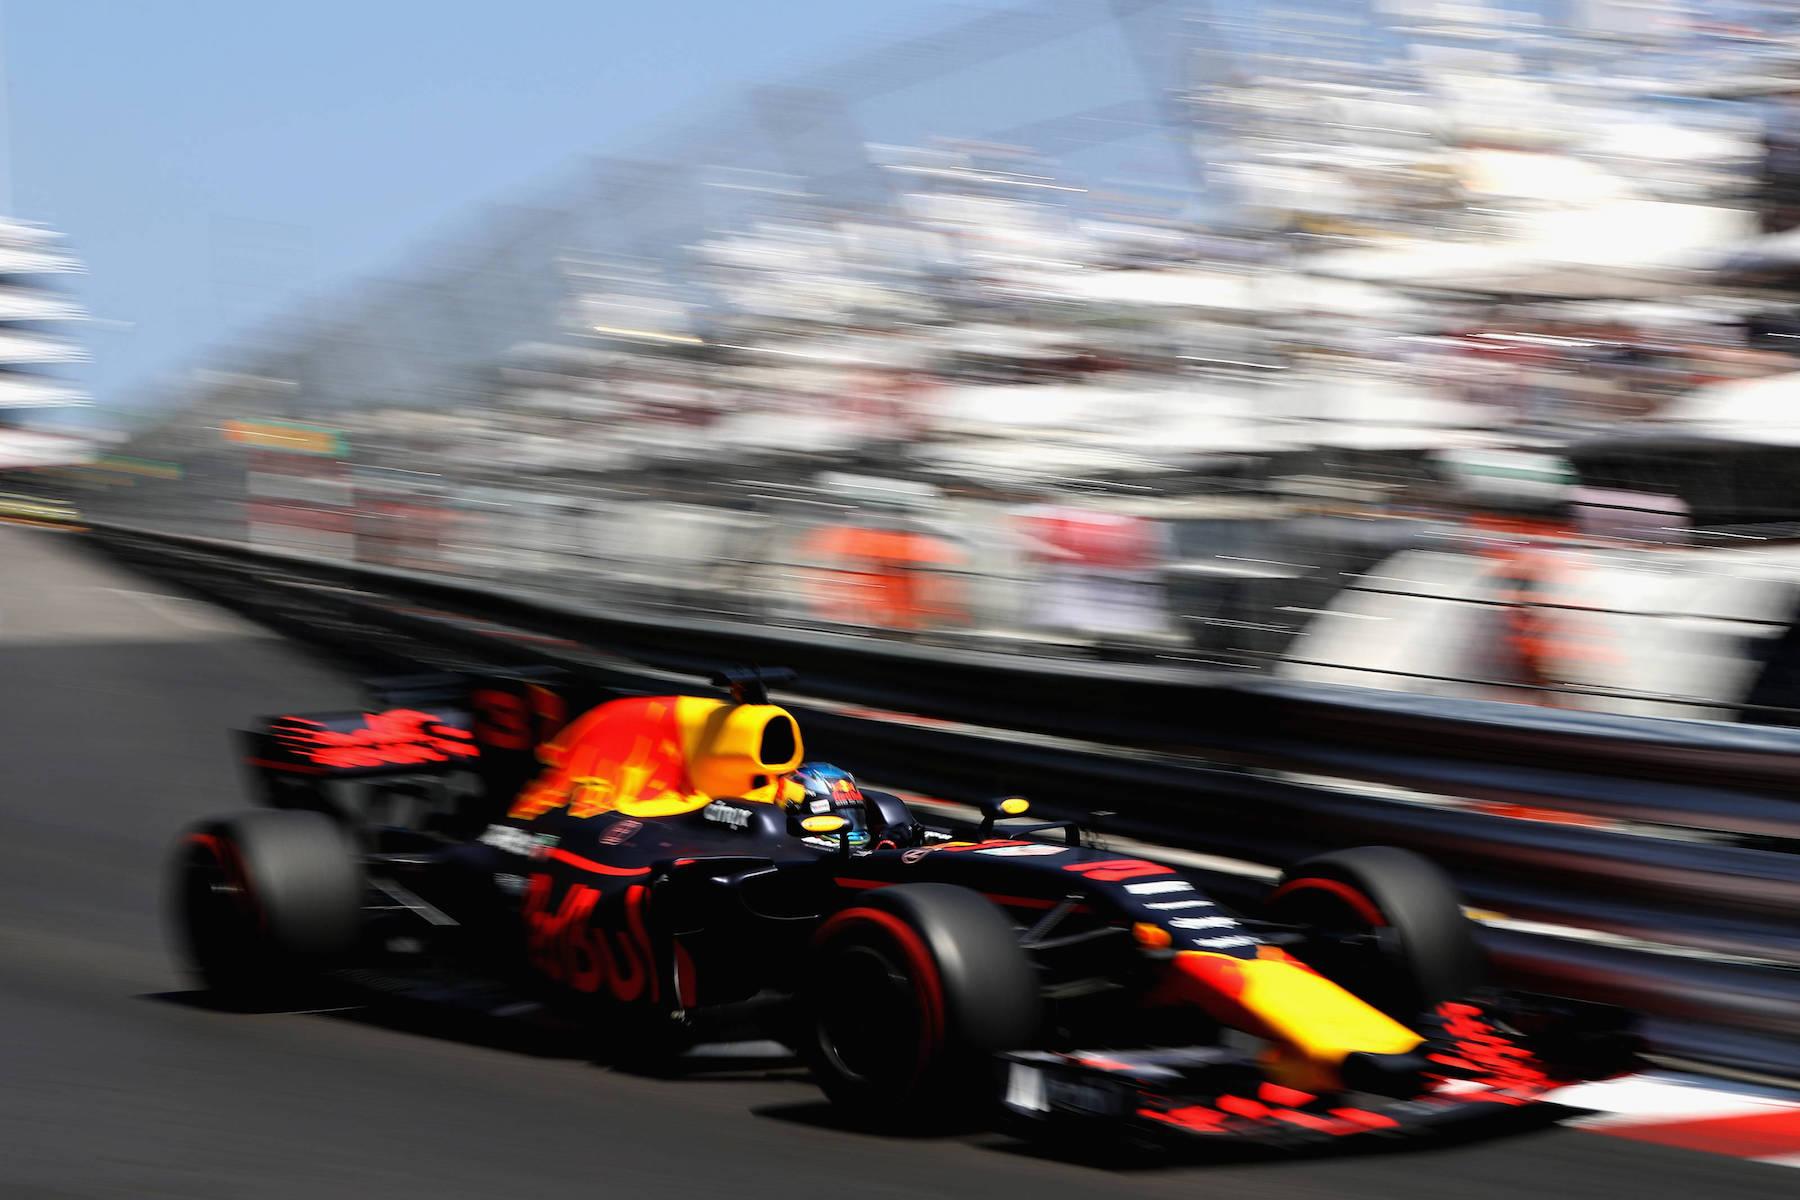 G 2017 Daniel Ricciardo | Red Bull RB13 | 2017 Monaco GP P3 2 copy.jpg